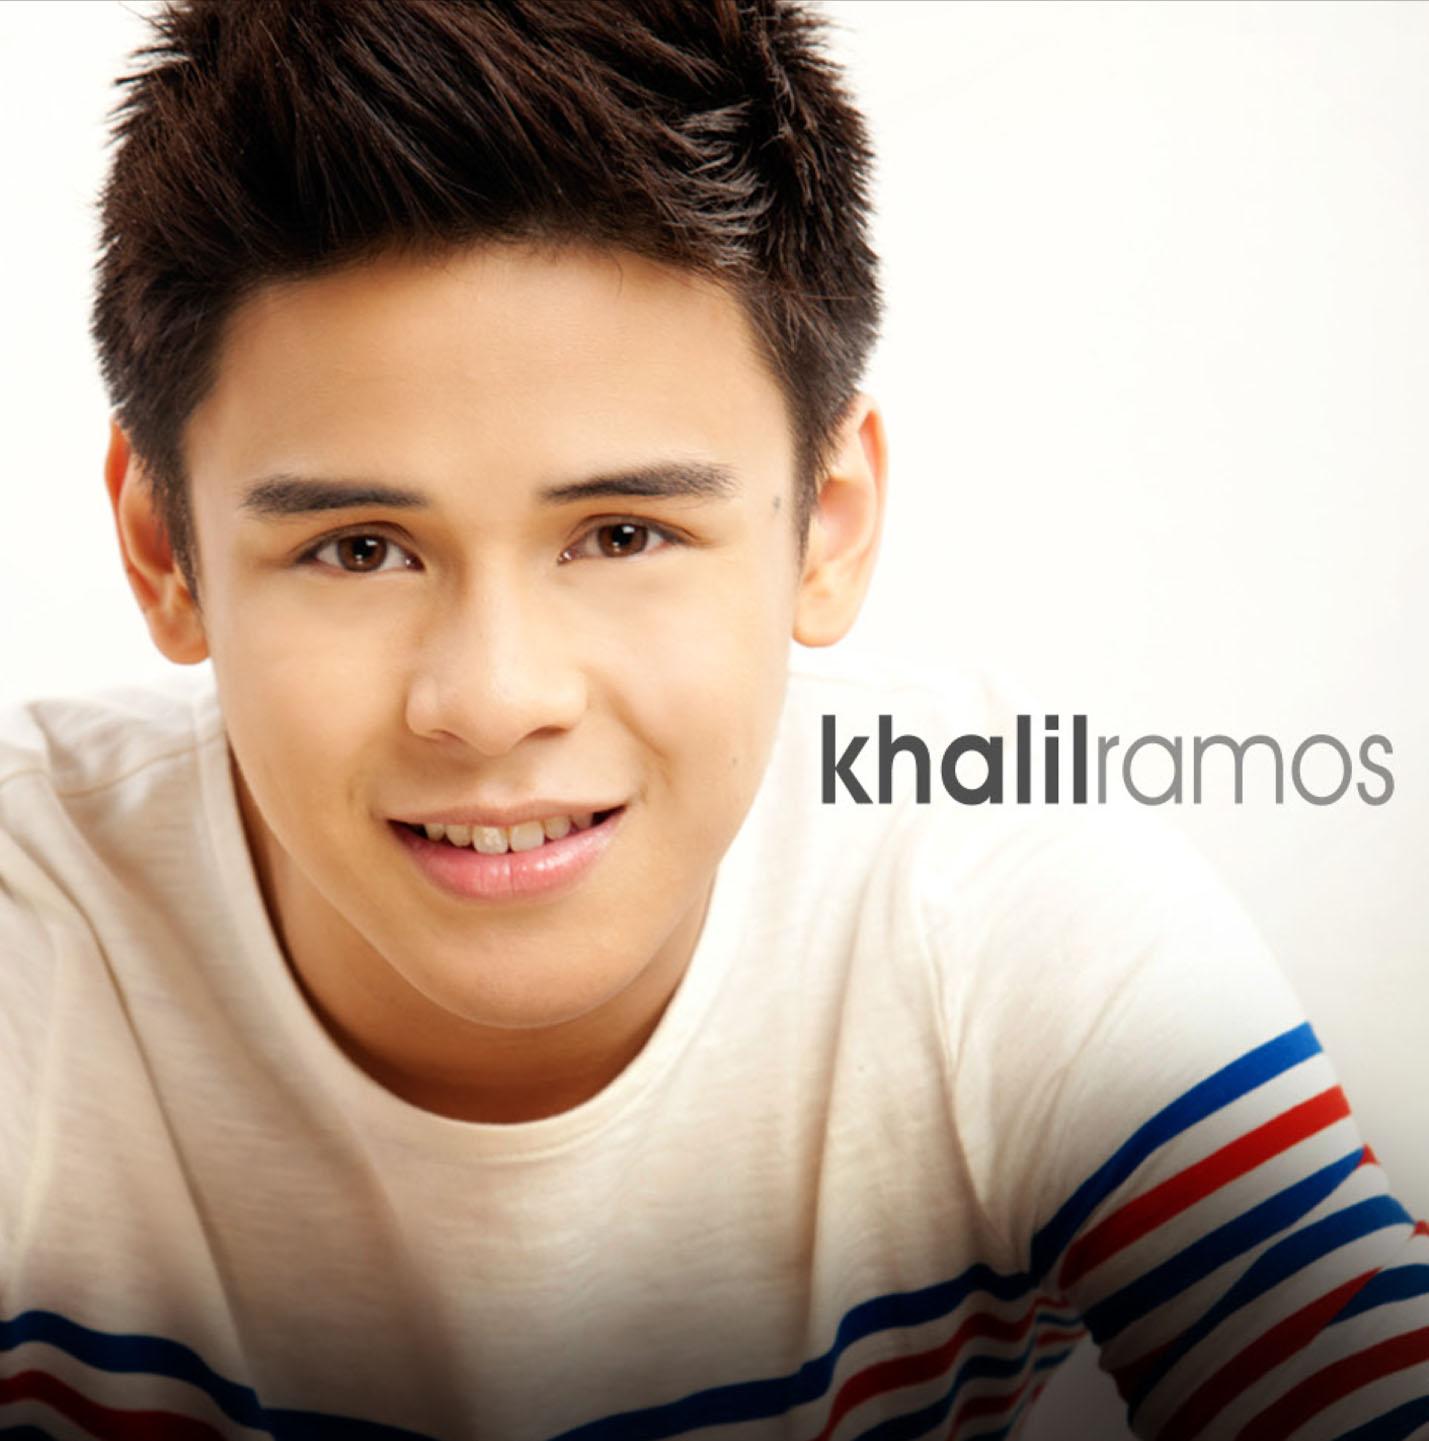 Singer Khalil Ramos - age: 25